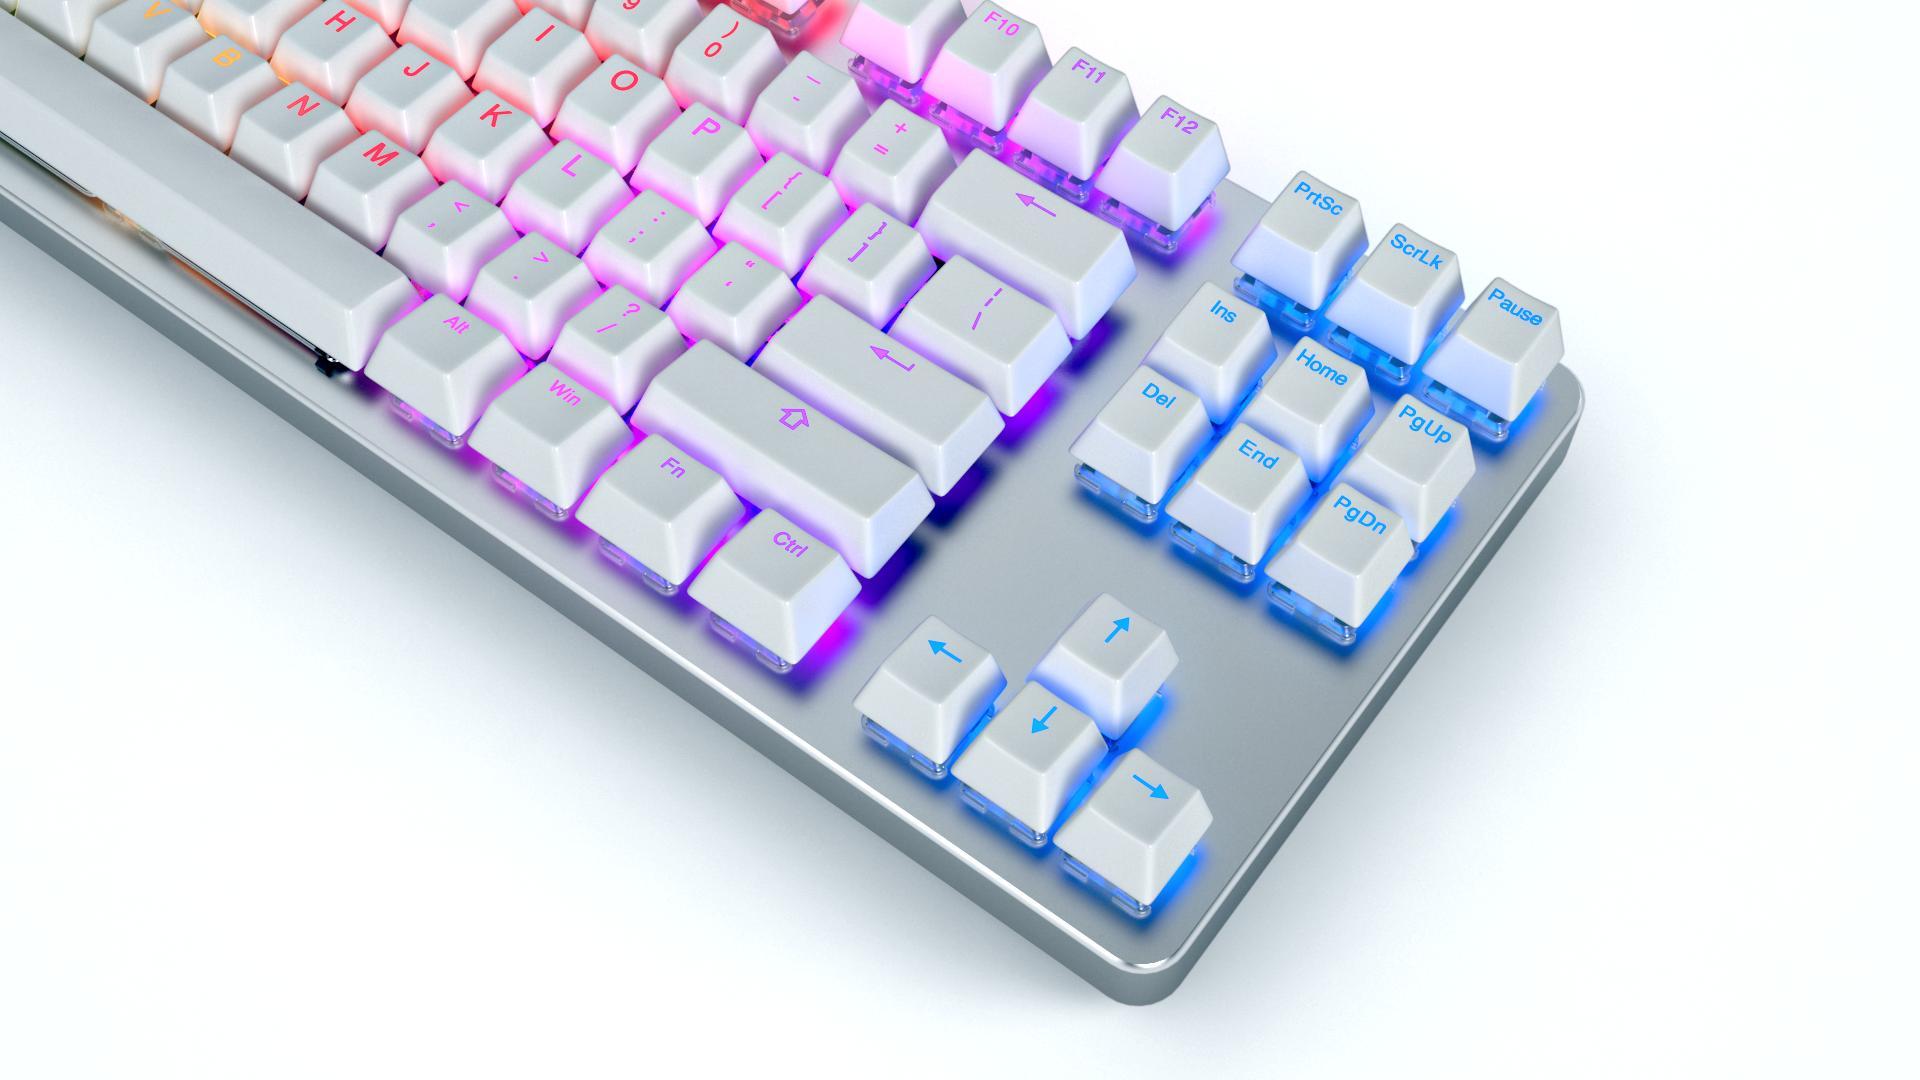 Вид клавиатуры-в картинках